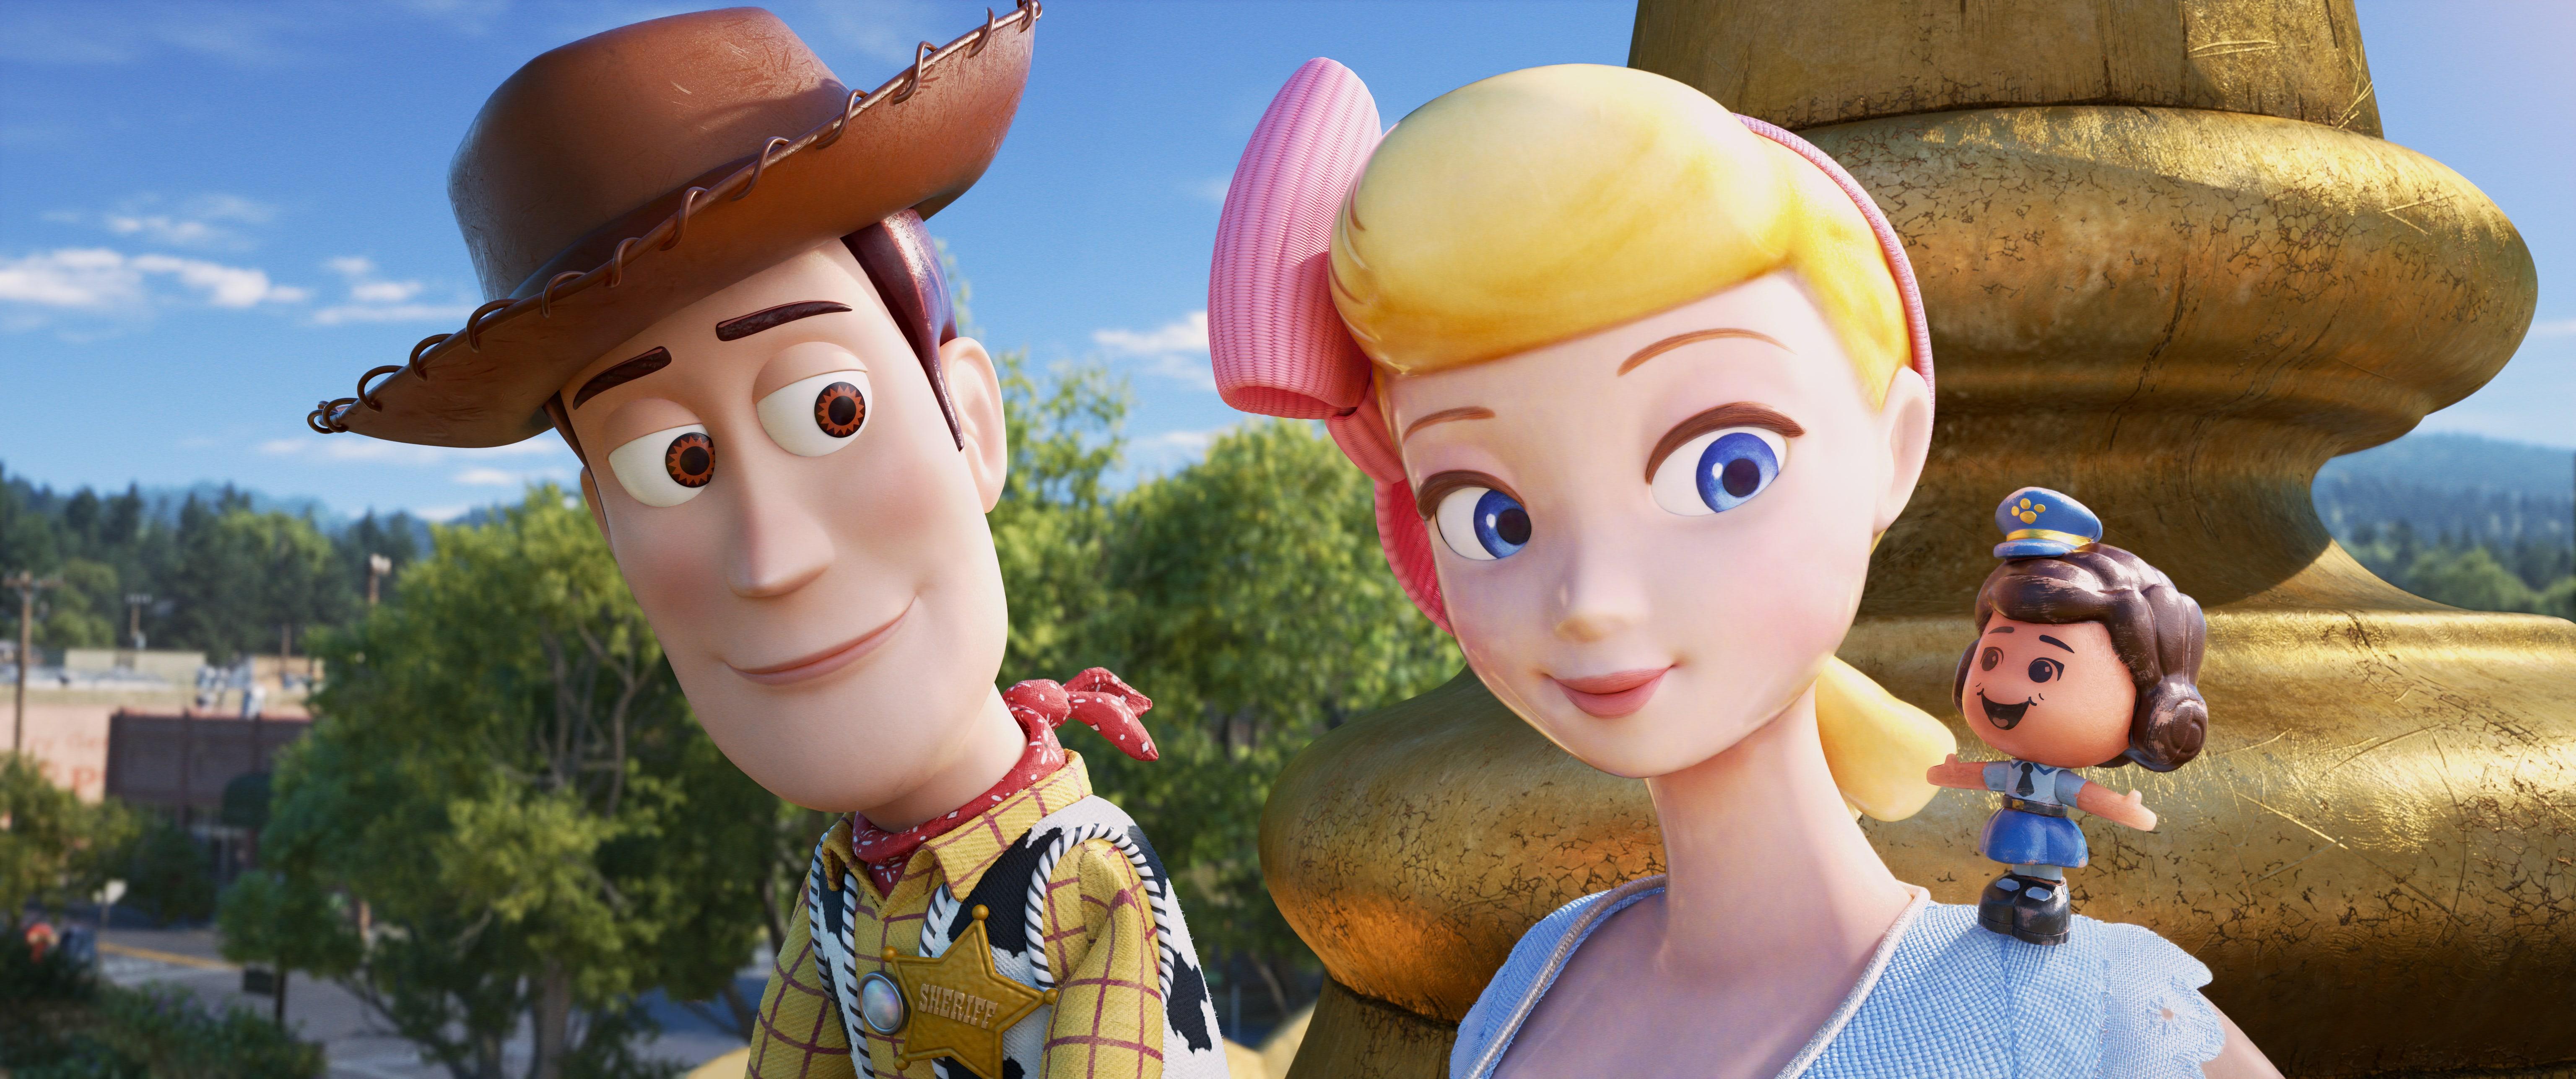 Toy Story 4 Bo Beep